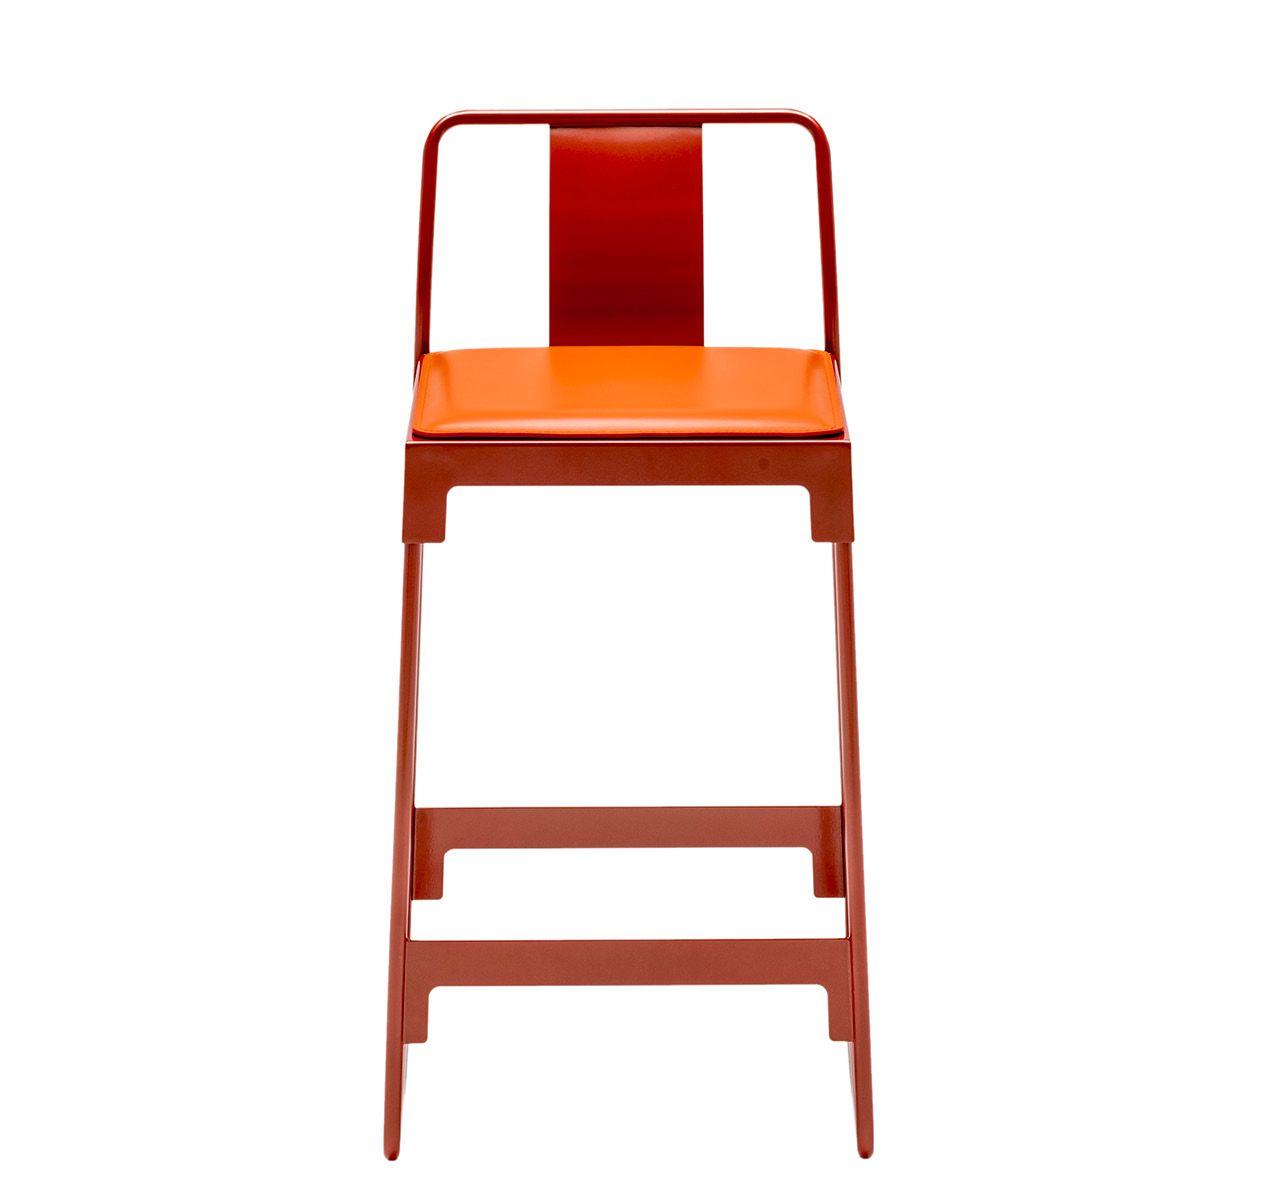 MINGX - Indoor Low Stool With Back Orange